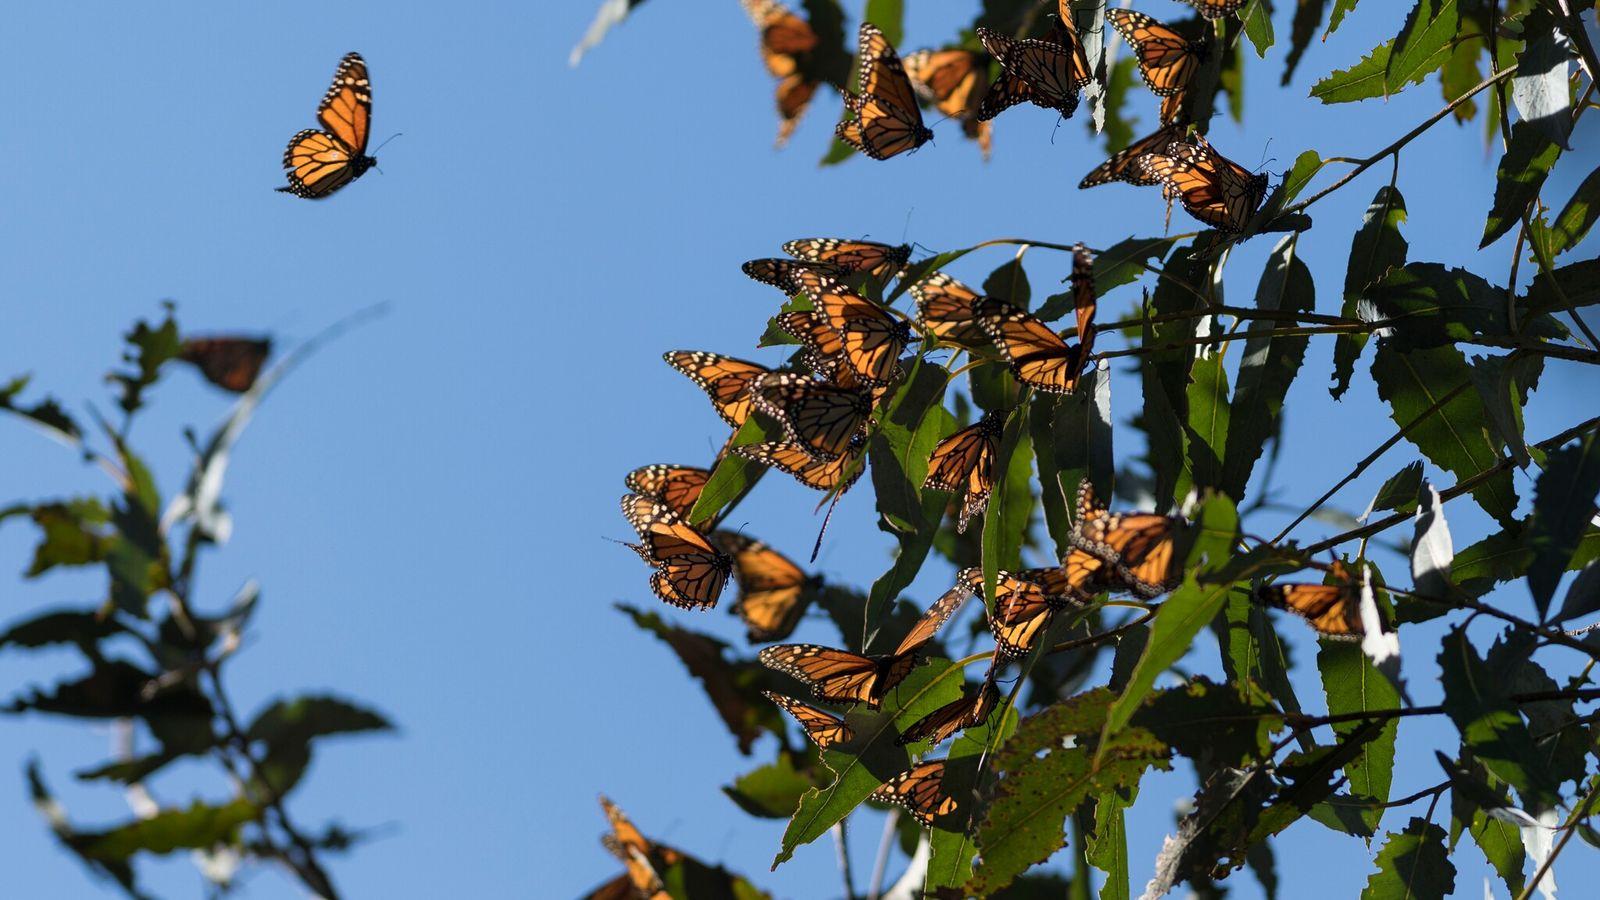 Miles de mariposas monarca en un árbol de eucalipto en Fremont, California, en 2018. En 2020, ...